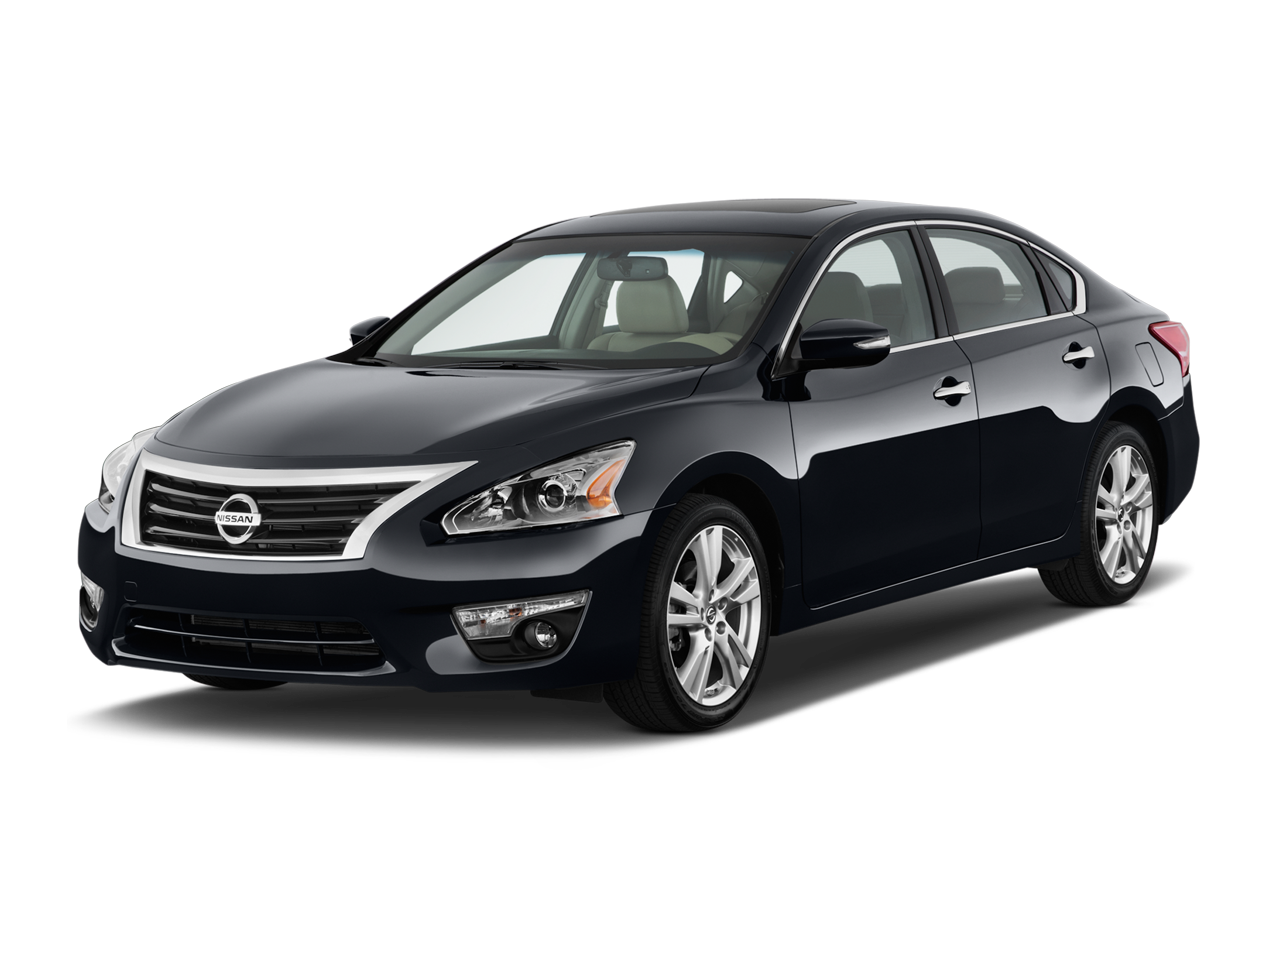 Image result for Nissan Altima